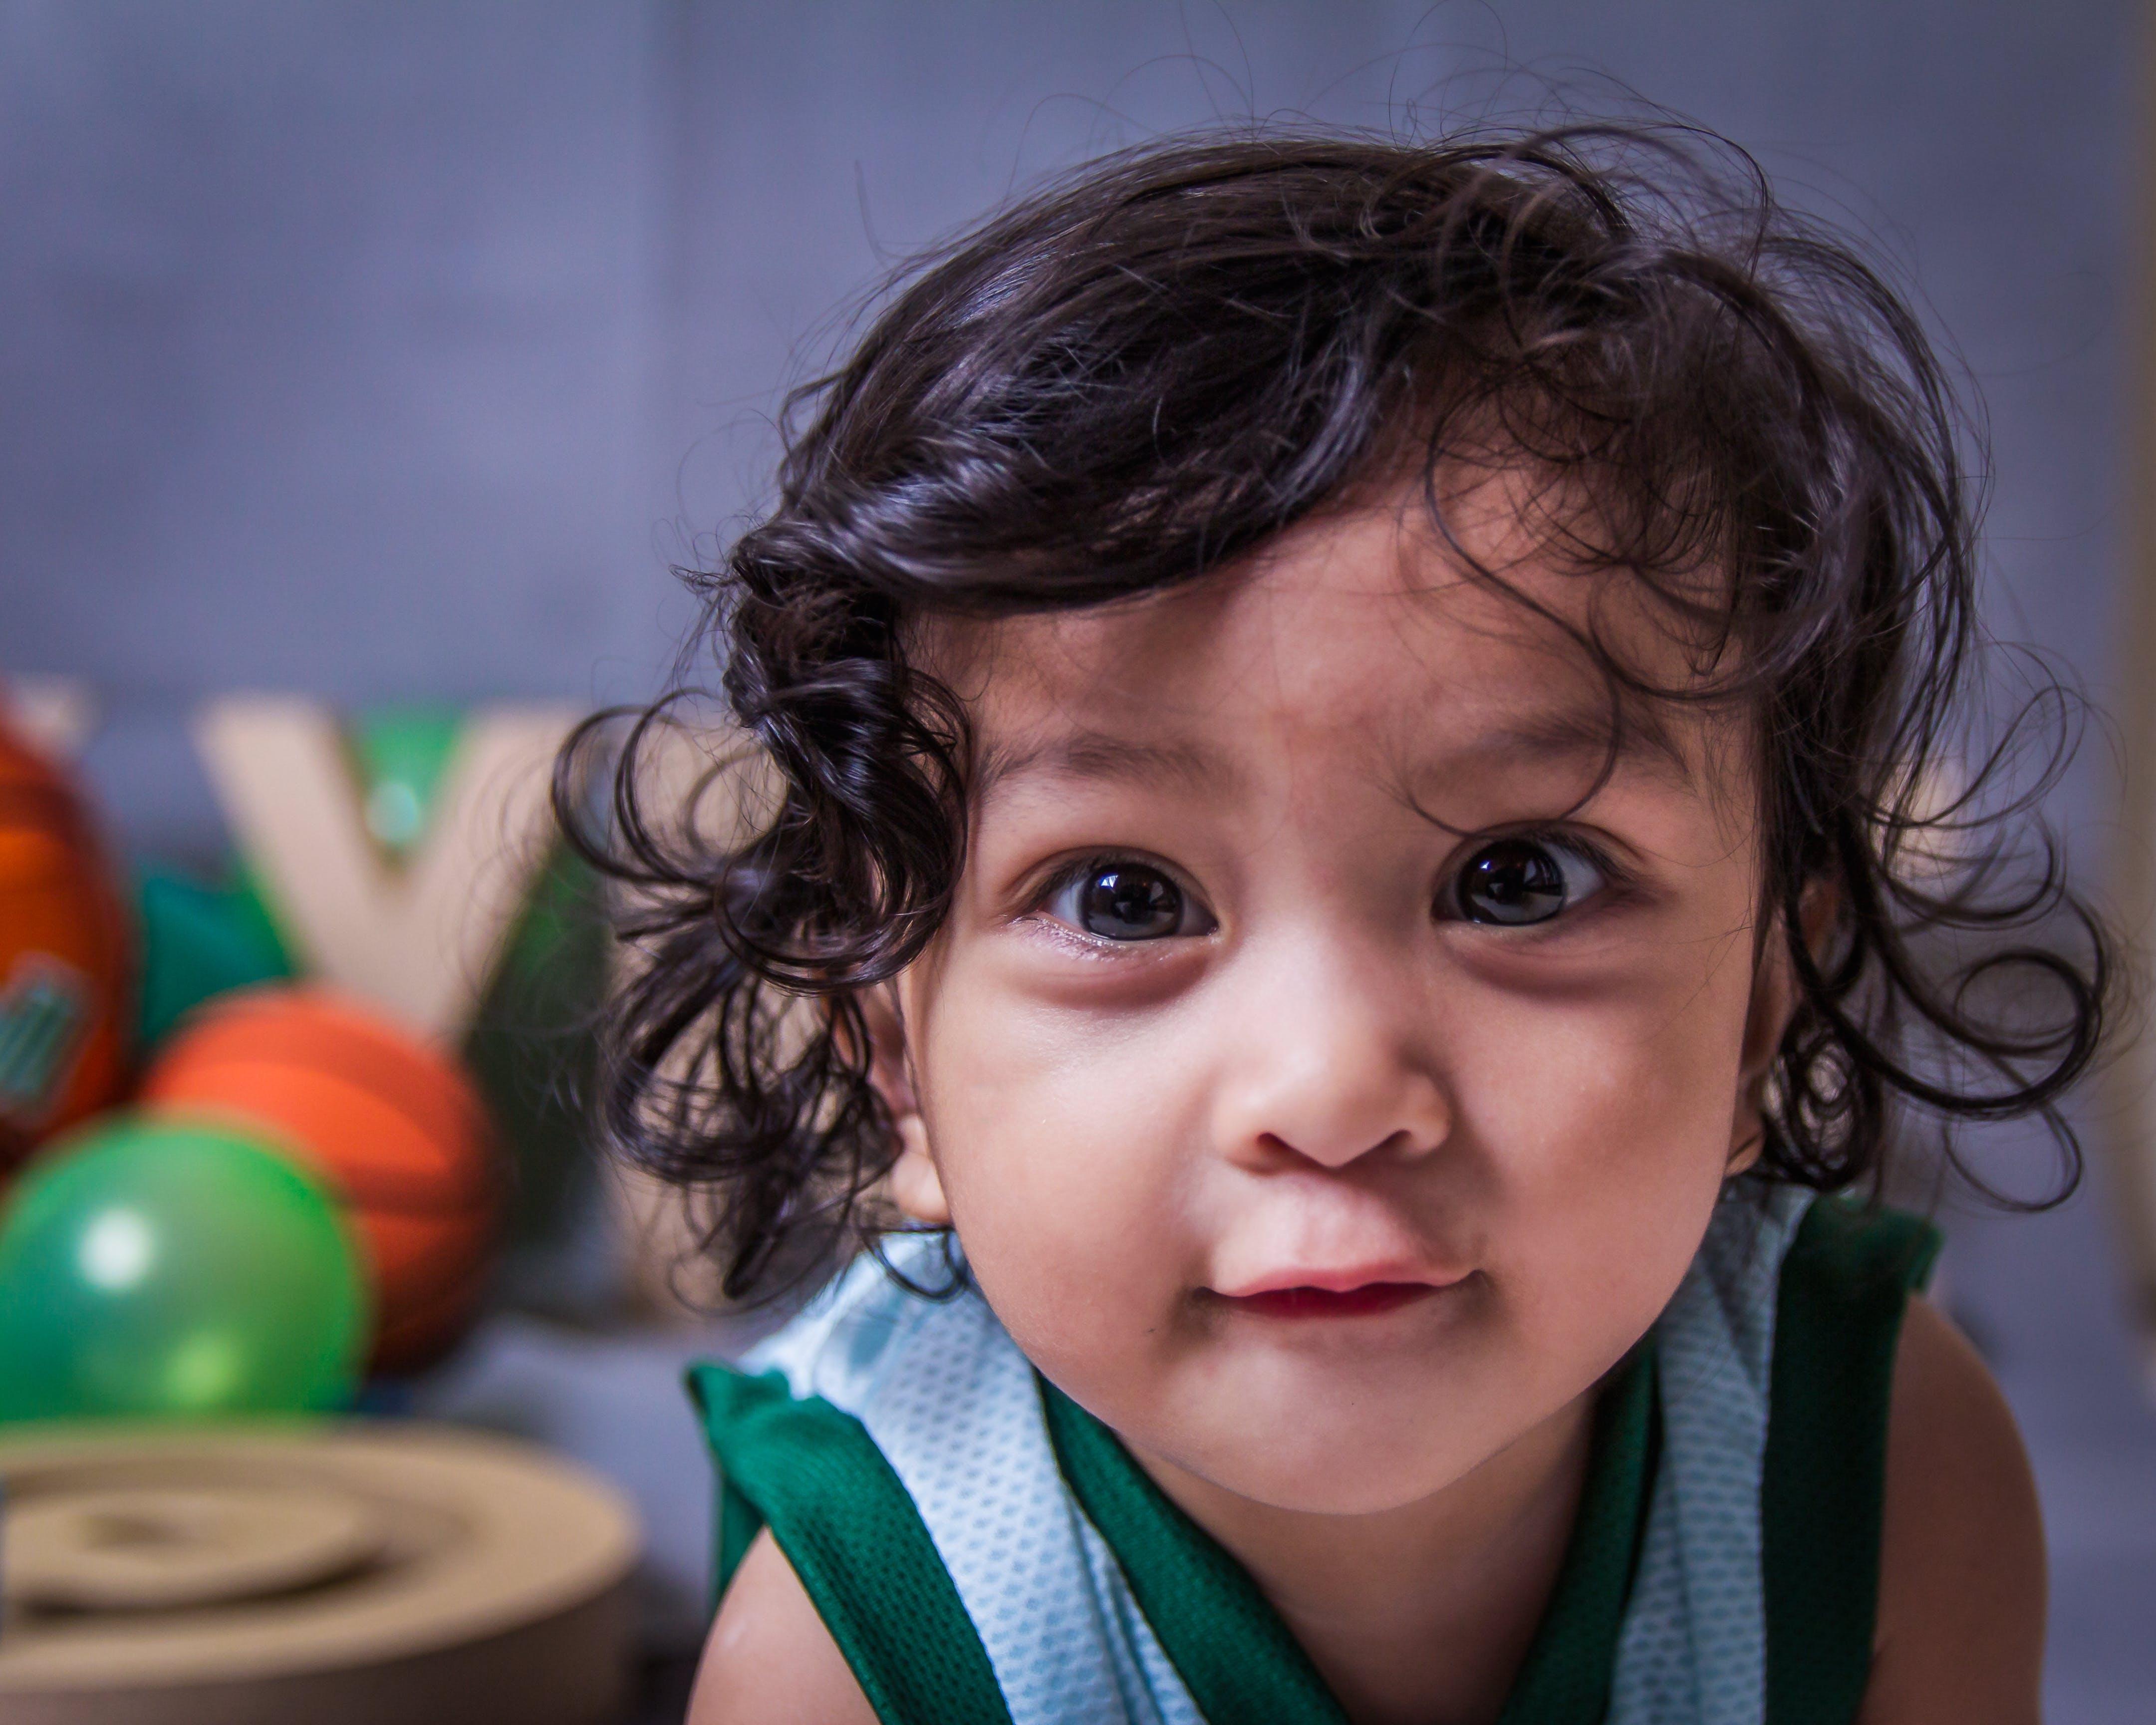 Free stock photo of baby